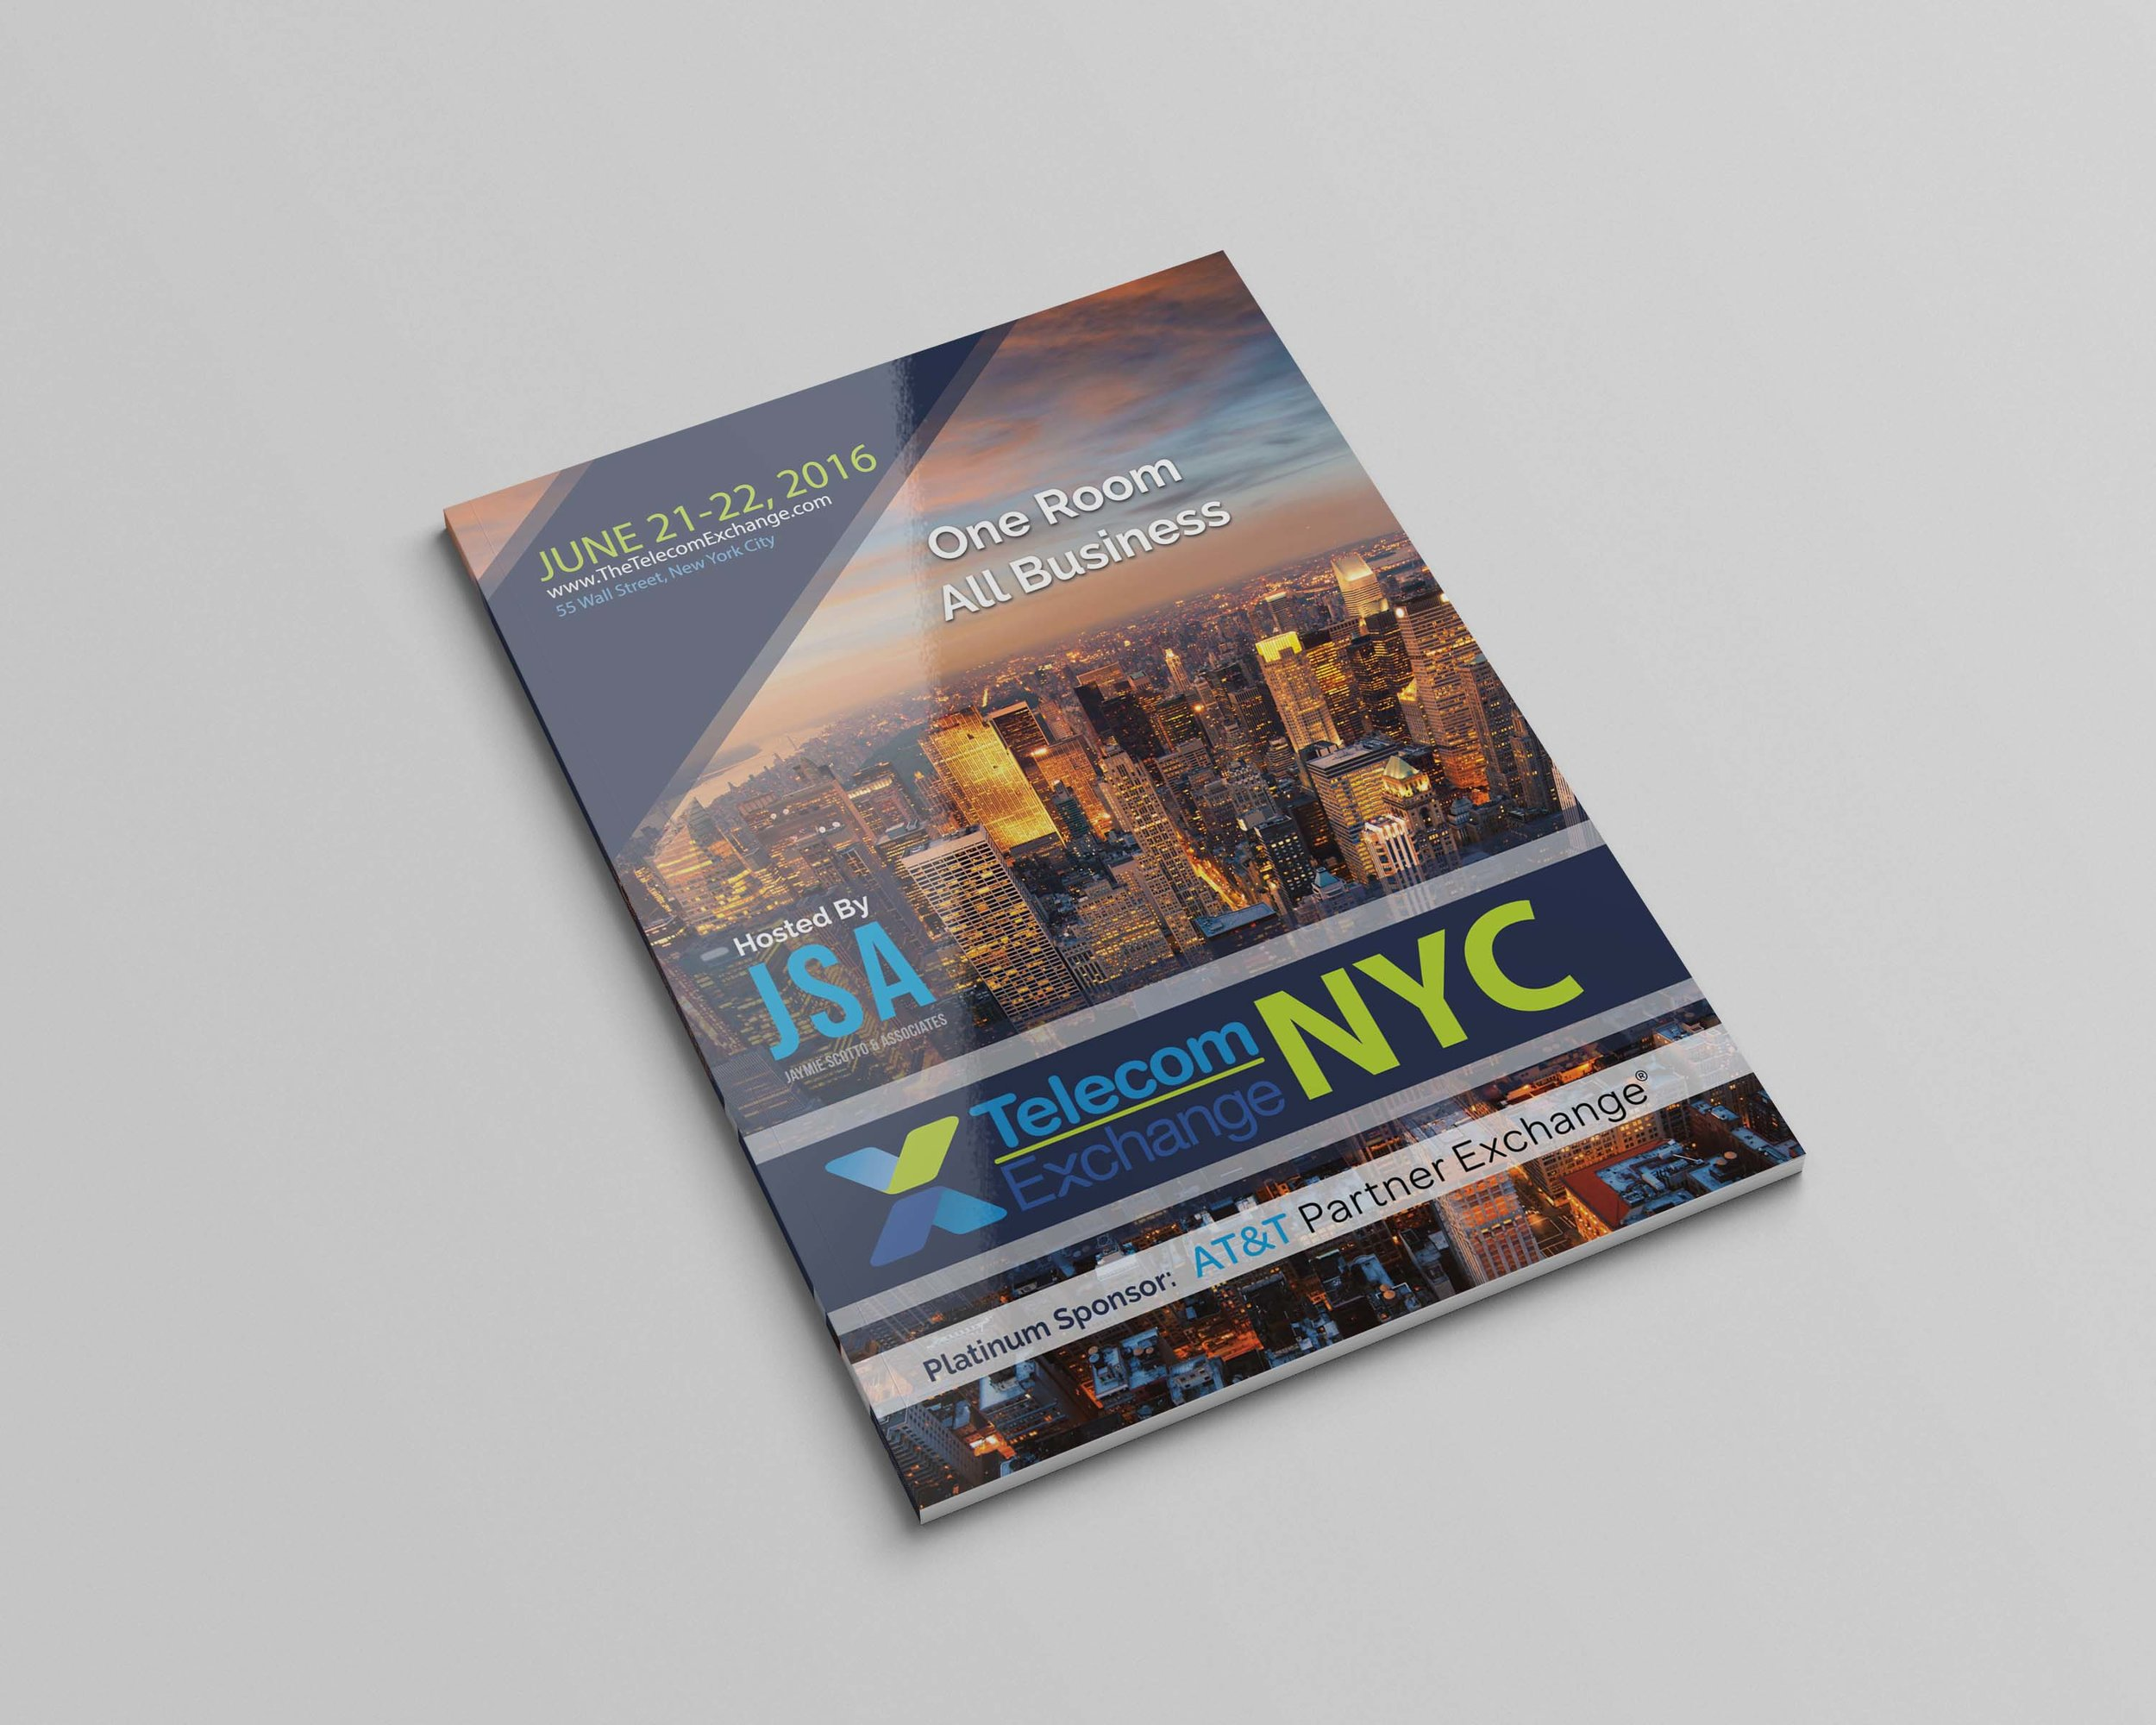 Telecom Exchange NY Directory.jpg